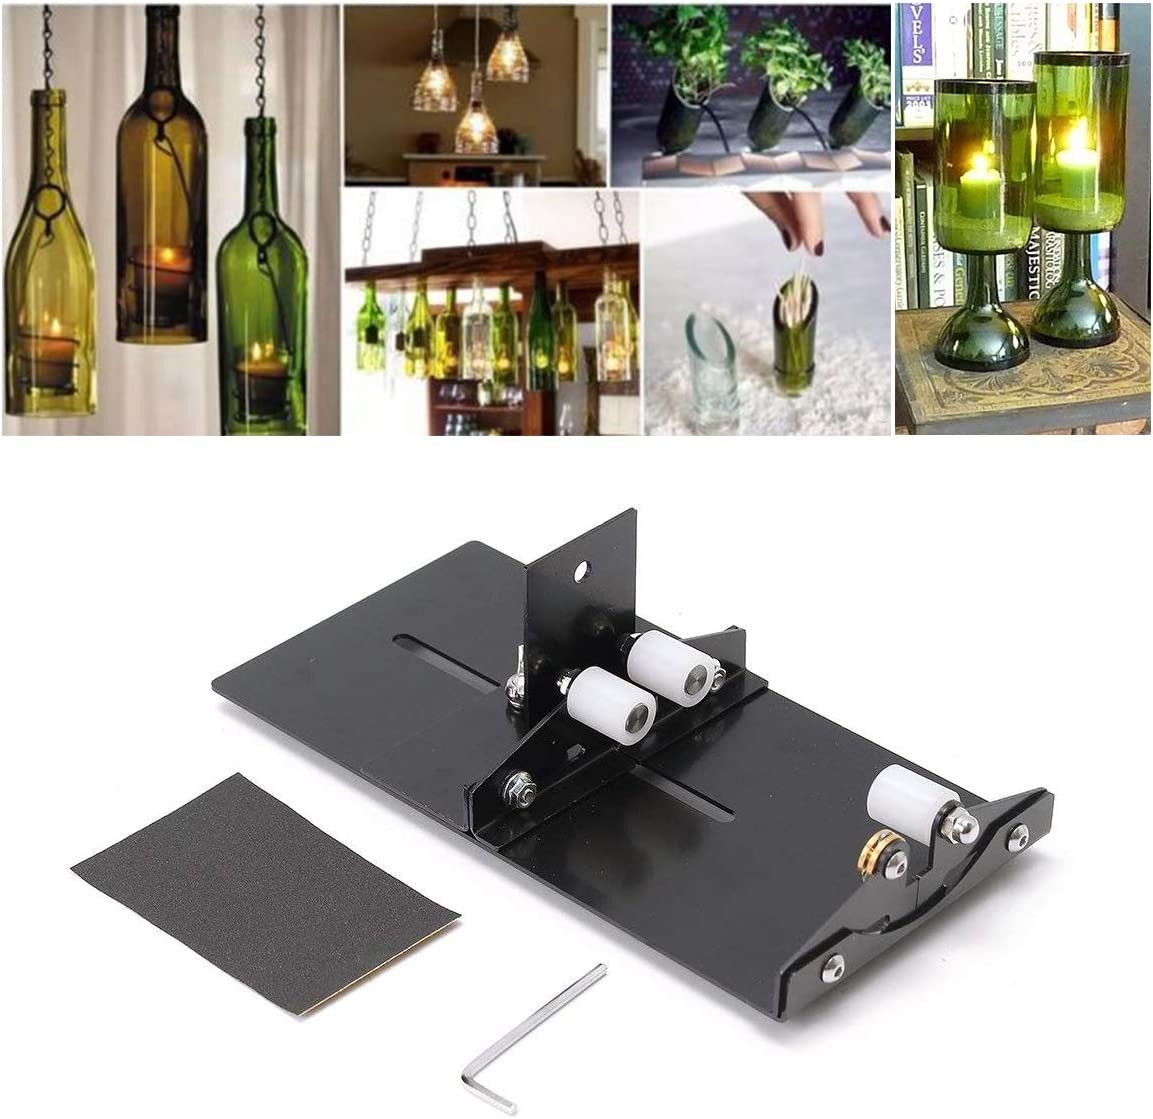 Amazon Com Glass Bottle Cutter Wine Beer Glass Cutter Diy Glass Bottle Cutting Tool Stainless Iron Glass Bottle Cutter Home Kitchen